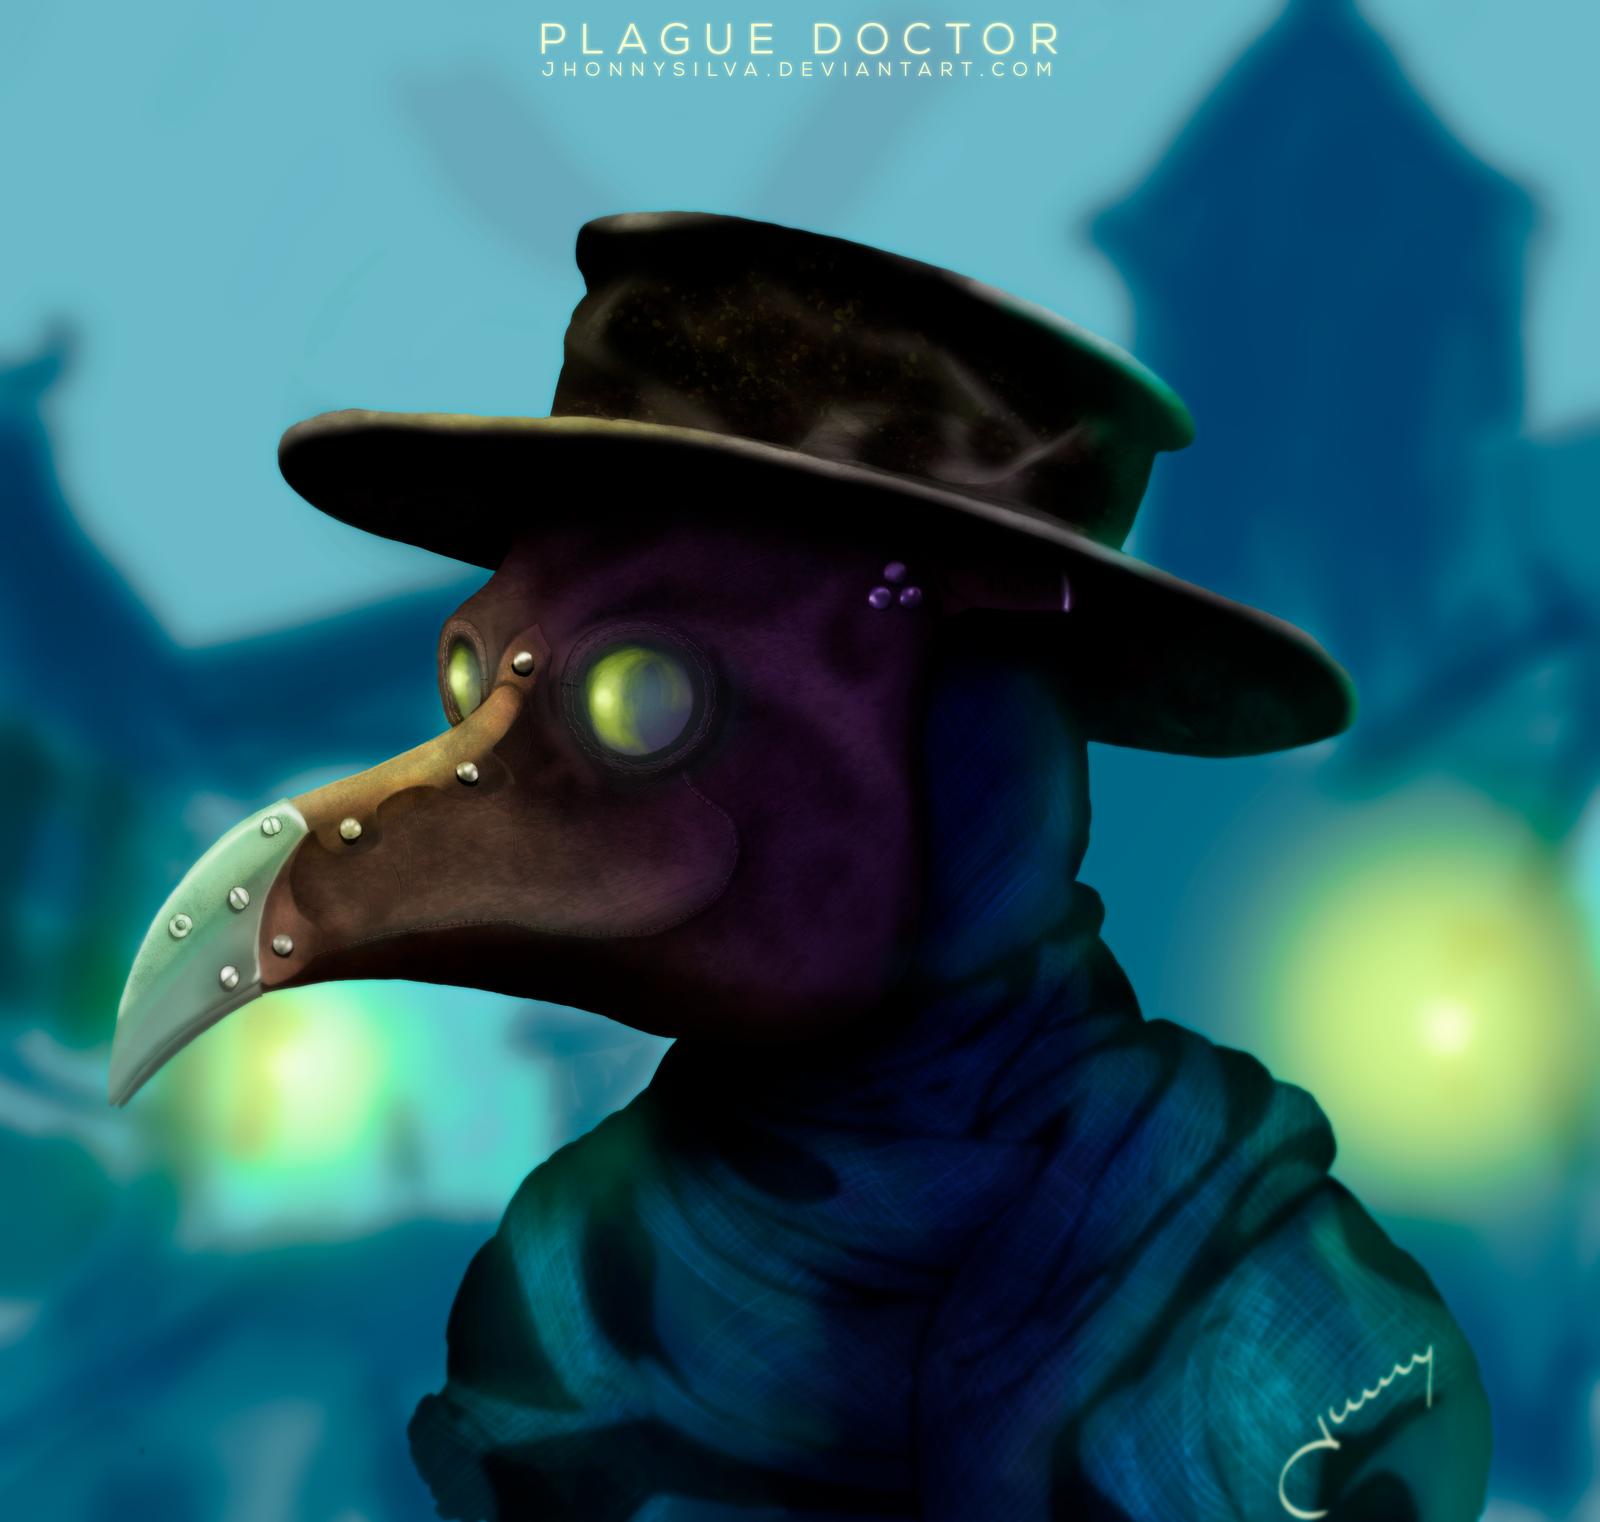 Plague Doctor - Fundo by JhonnySilva